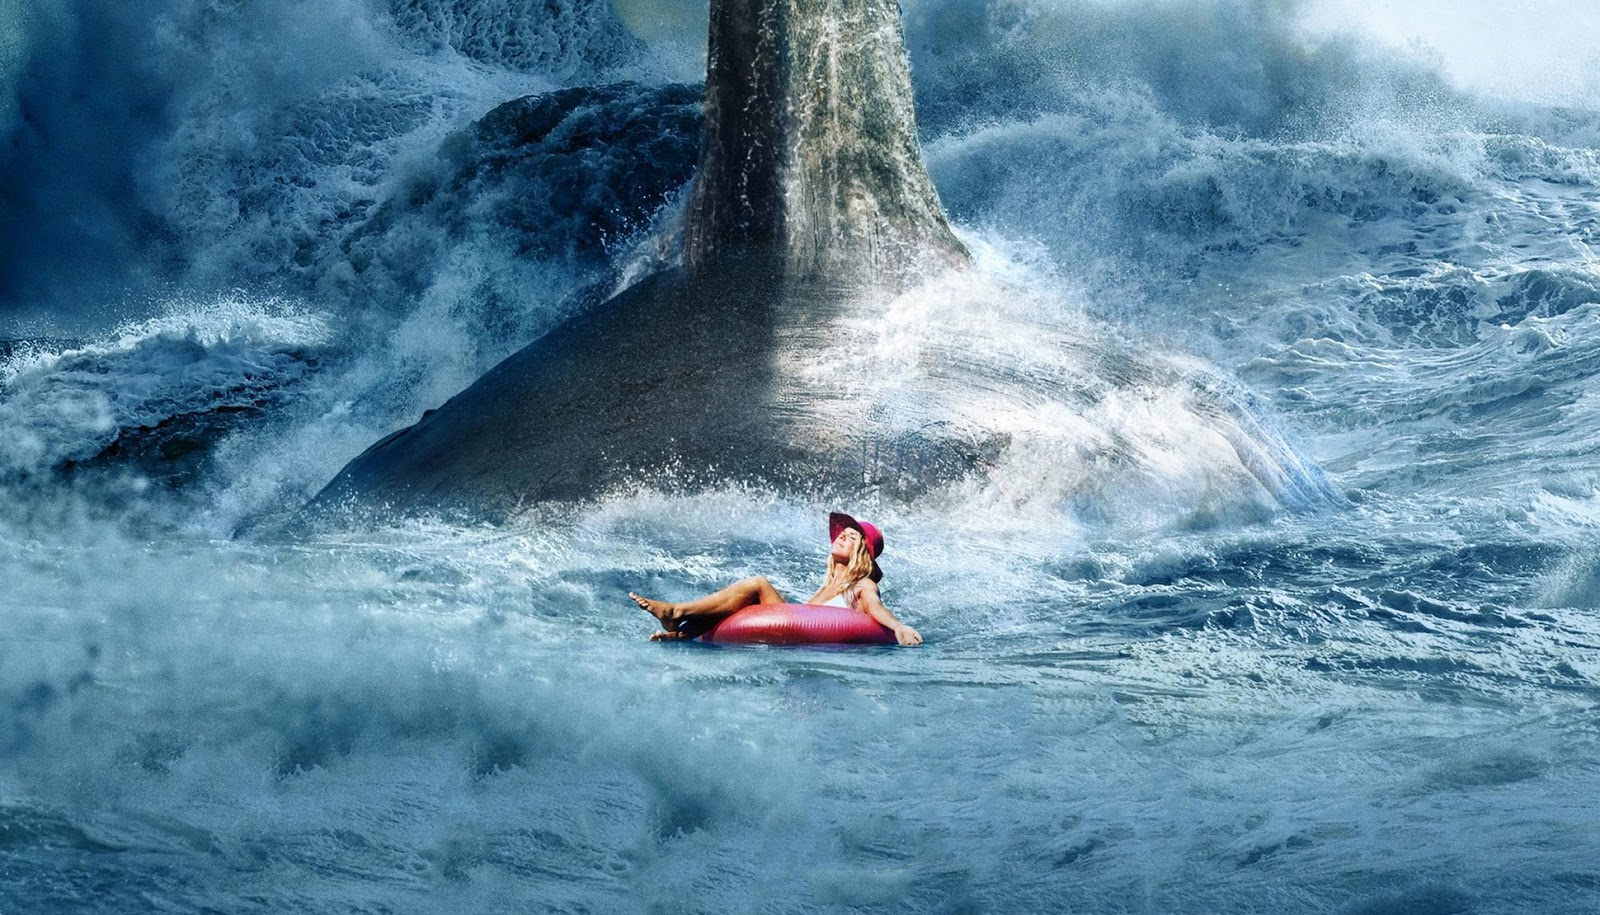 "Phim The Meg ""Cá Mập Khổng Lồ"" Megalodon Thời Tiền Sử 2018"